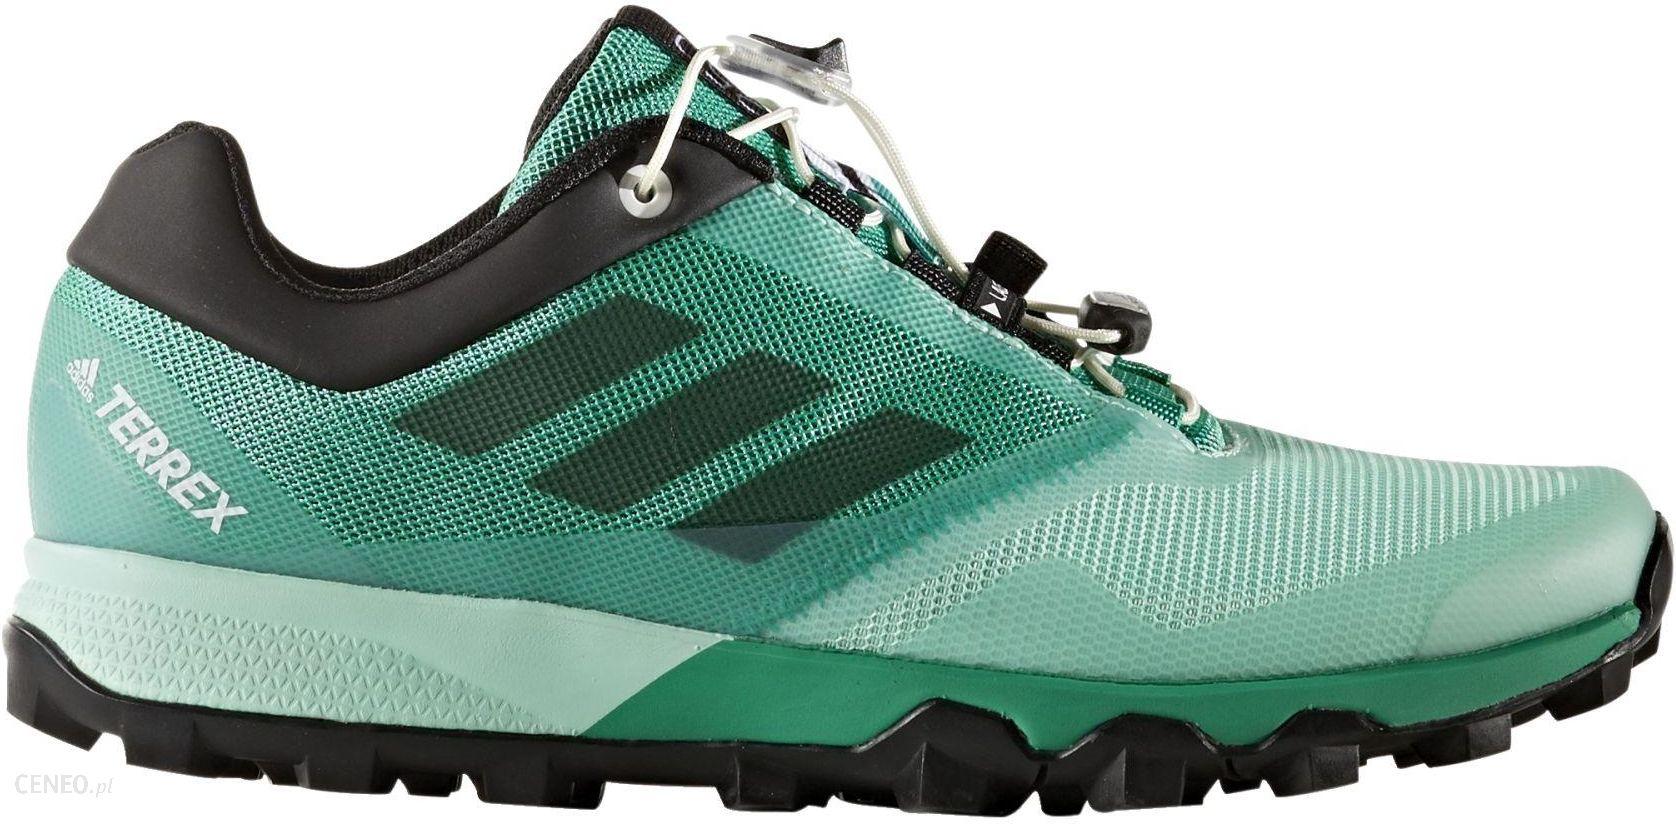 Adidas Buty Terrex TRailmaker W Core Green Core BlackEasy Green Ceny i opinie Ceneo.pl